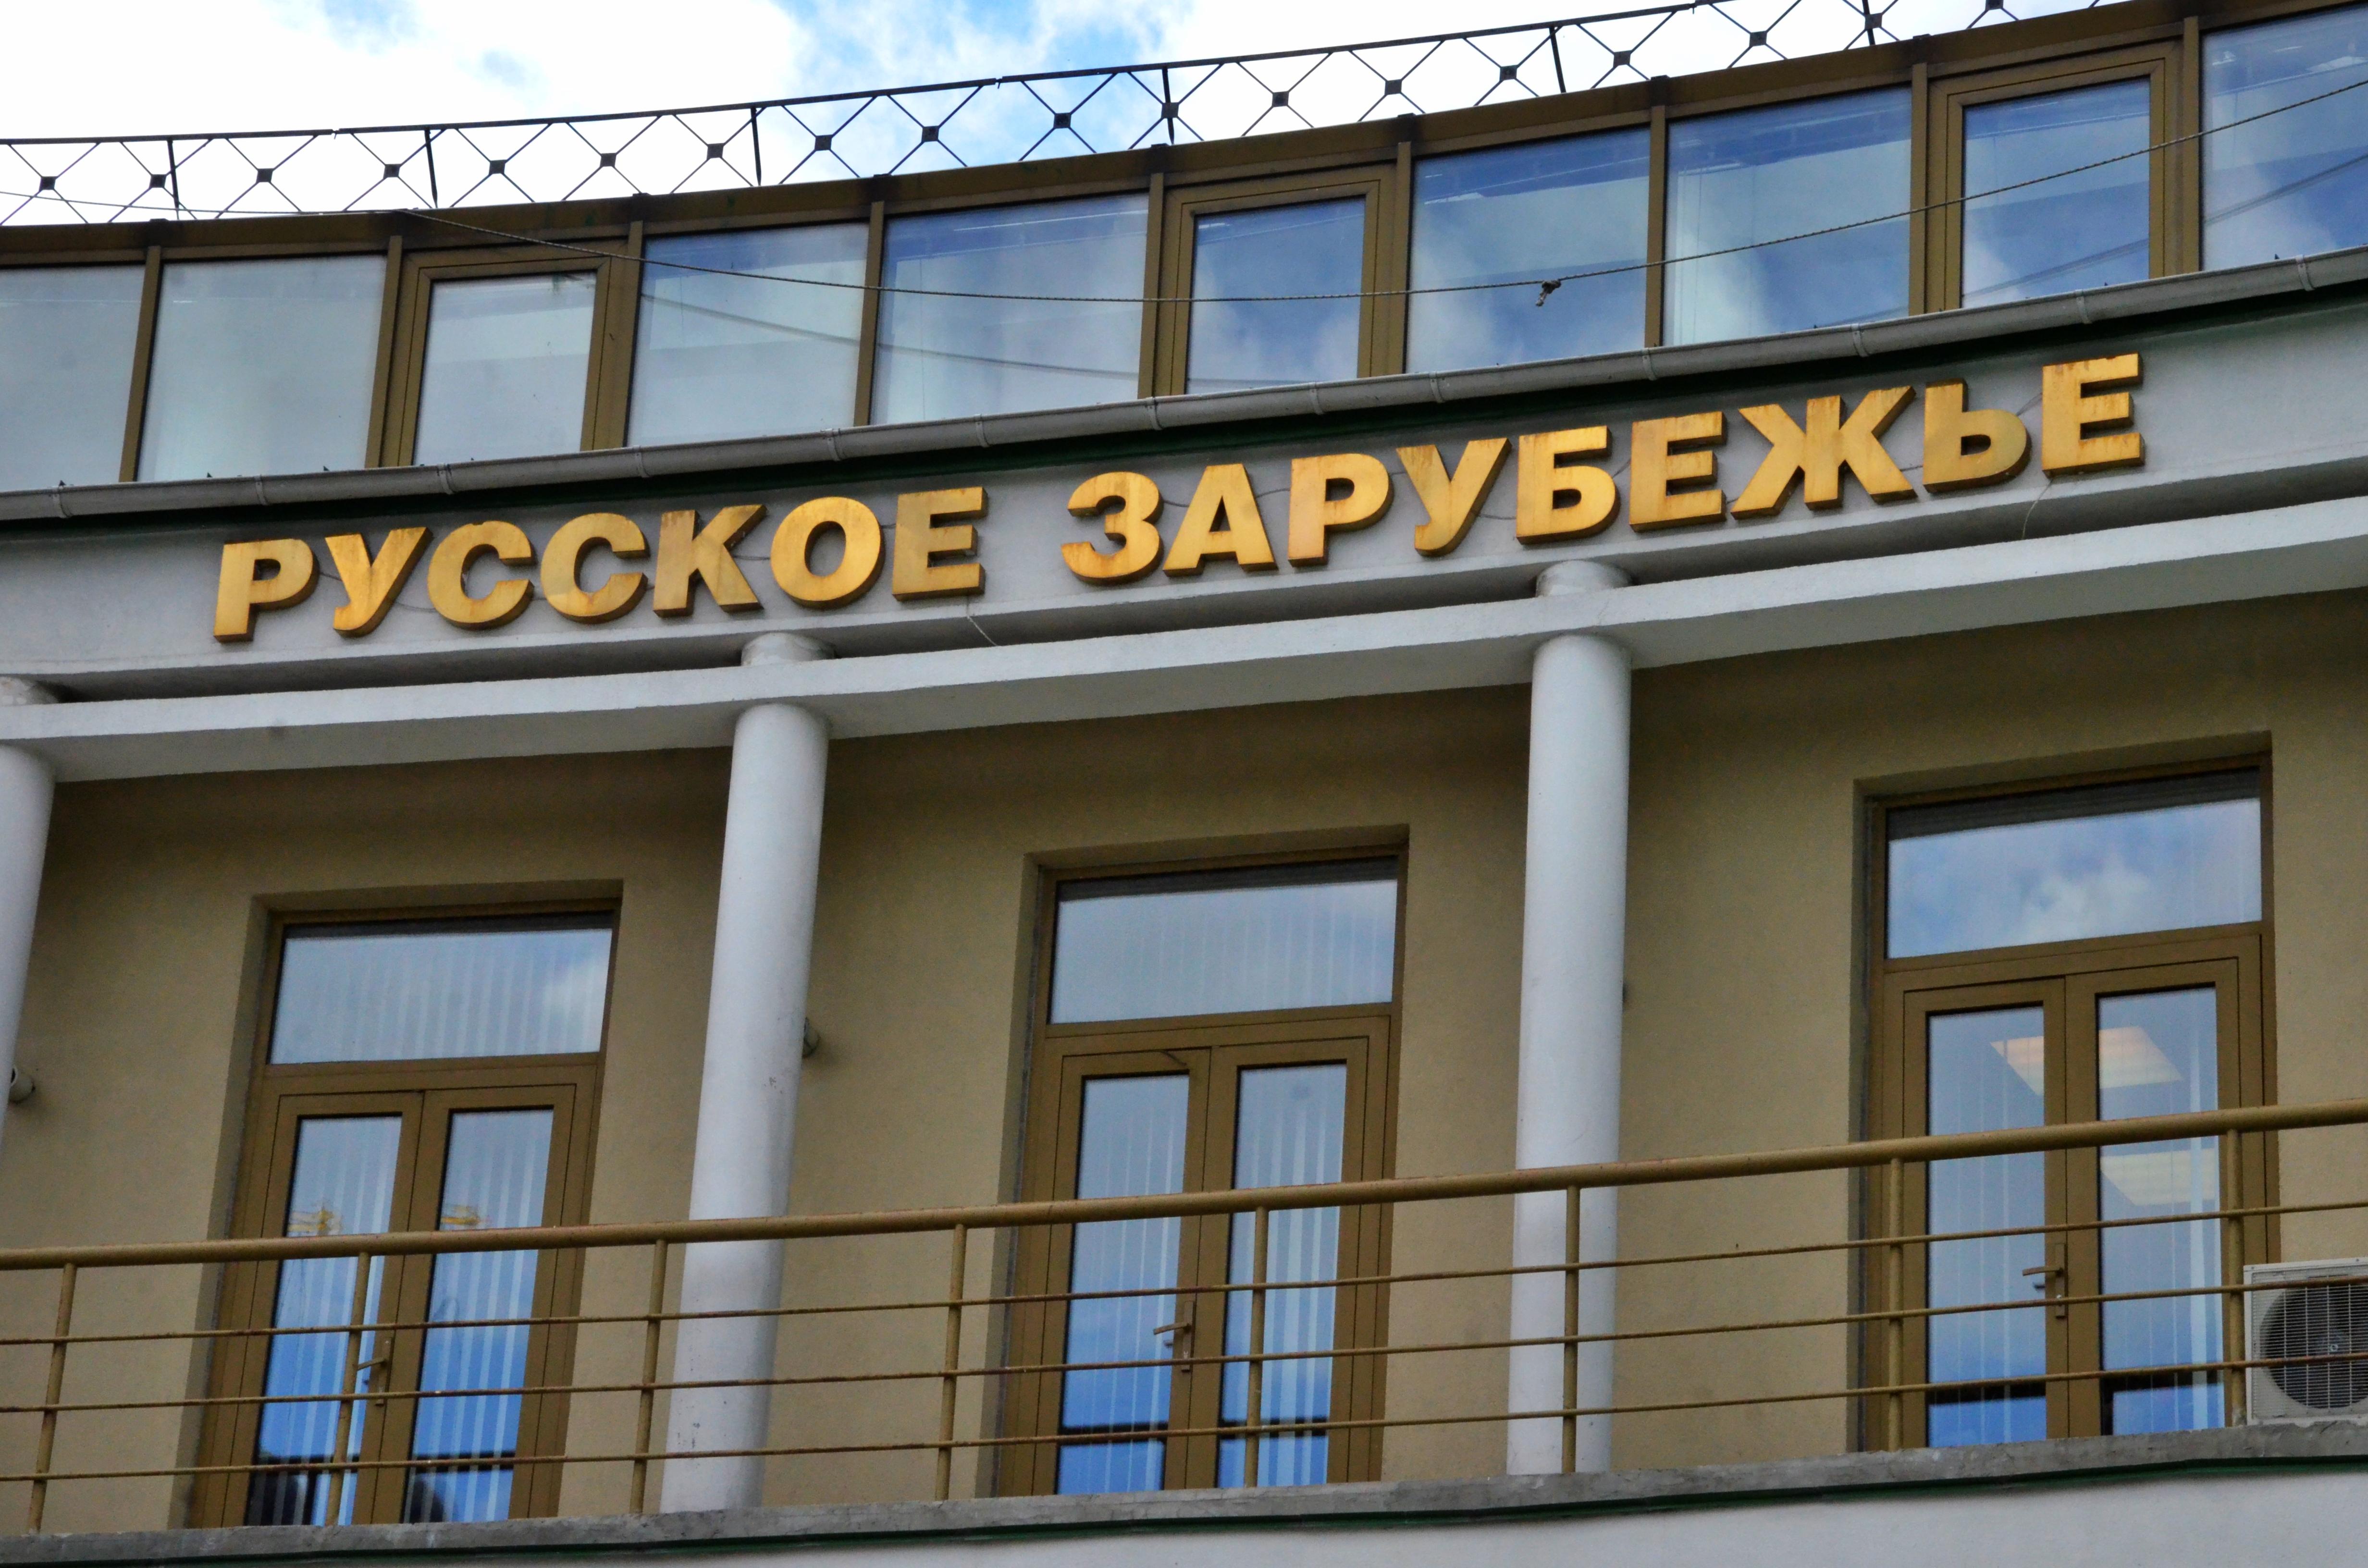 Дом русского зарубежья на таганке адрес в виллу вторичку купить тайланде